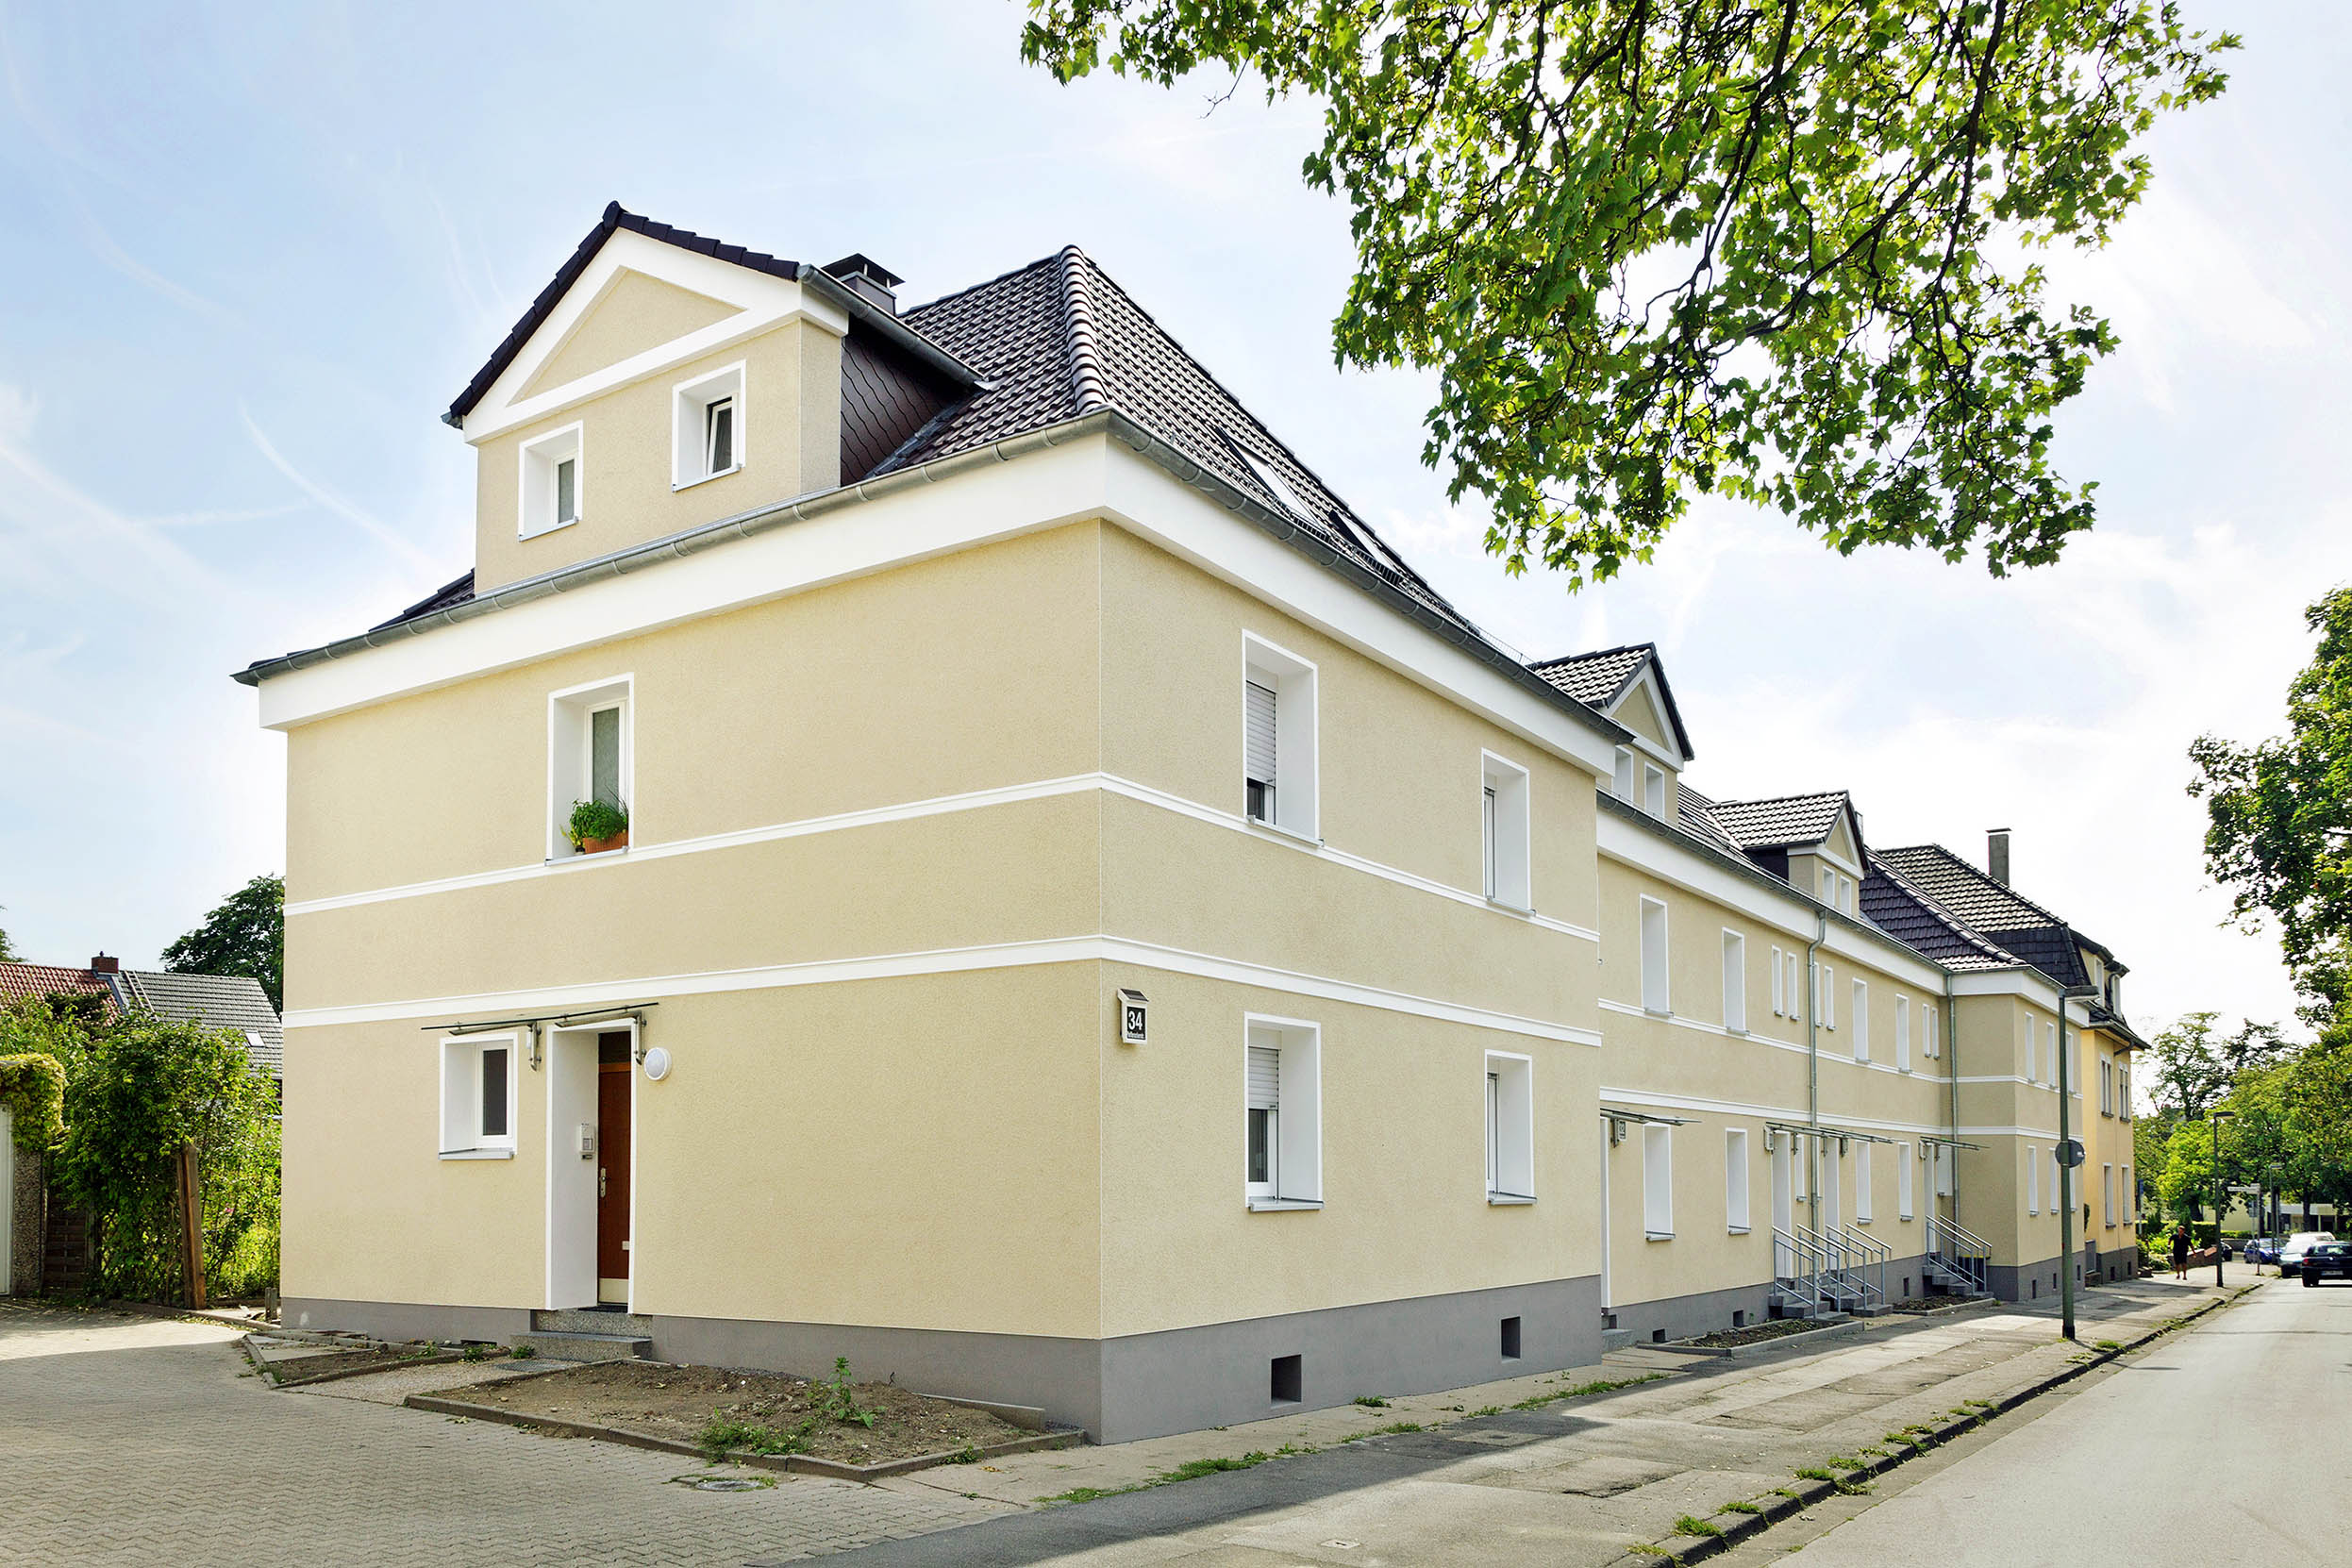 pfefferackerstraße-image-1